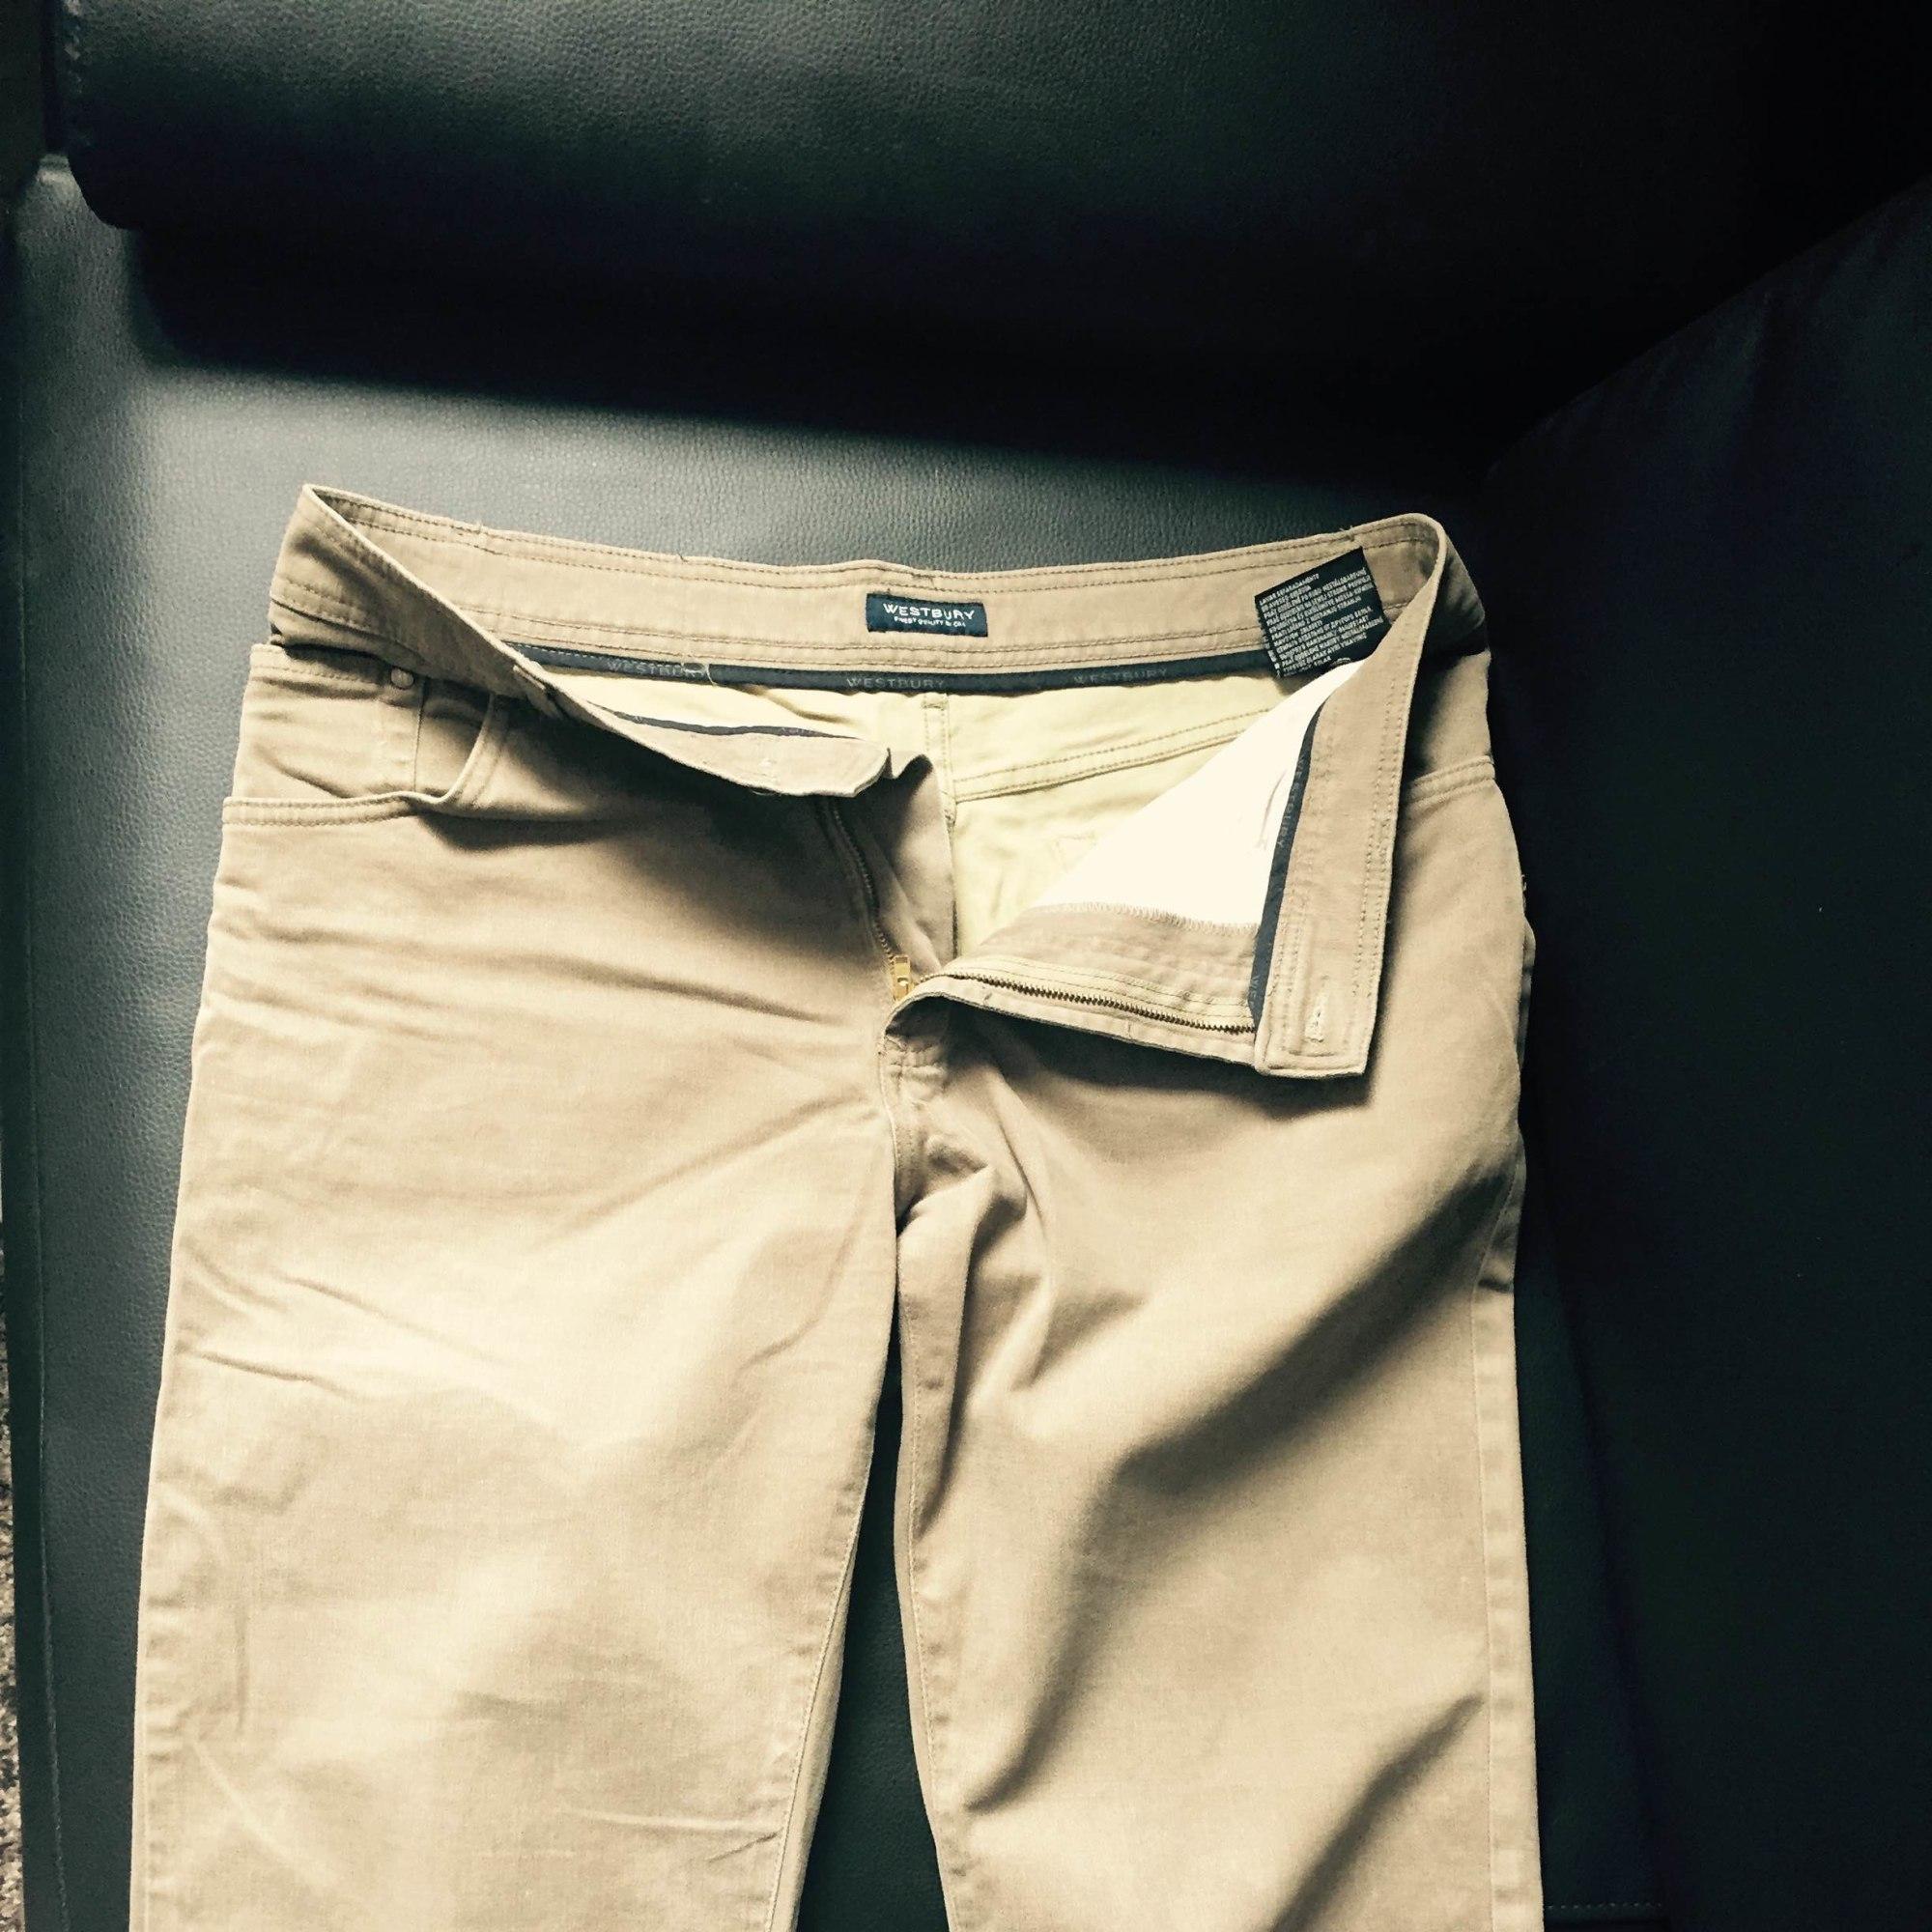 pantalon homme westbury